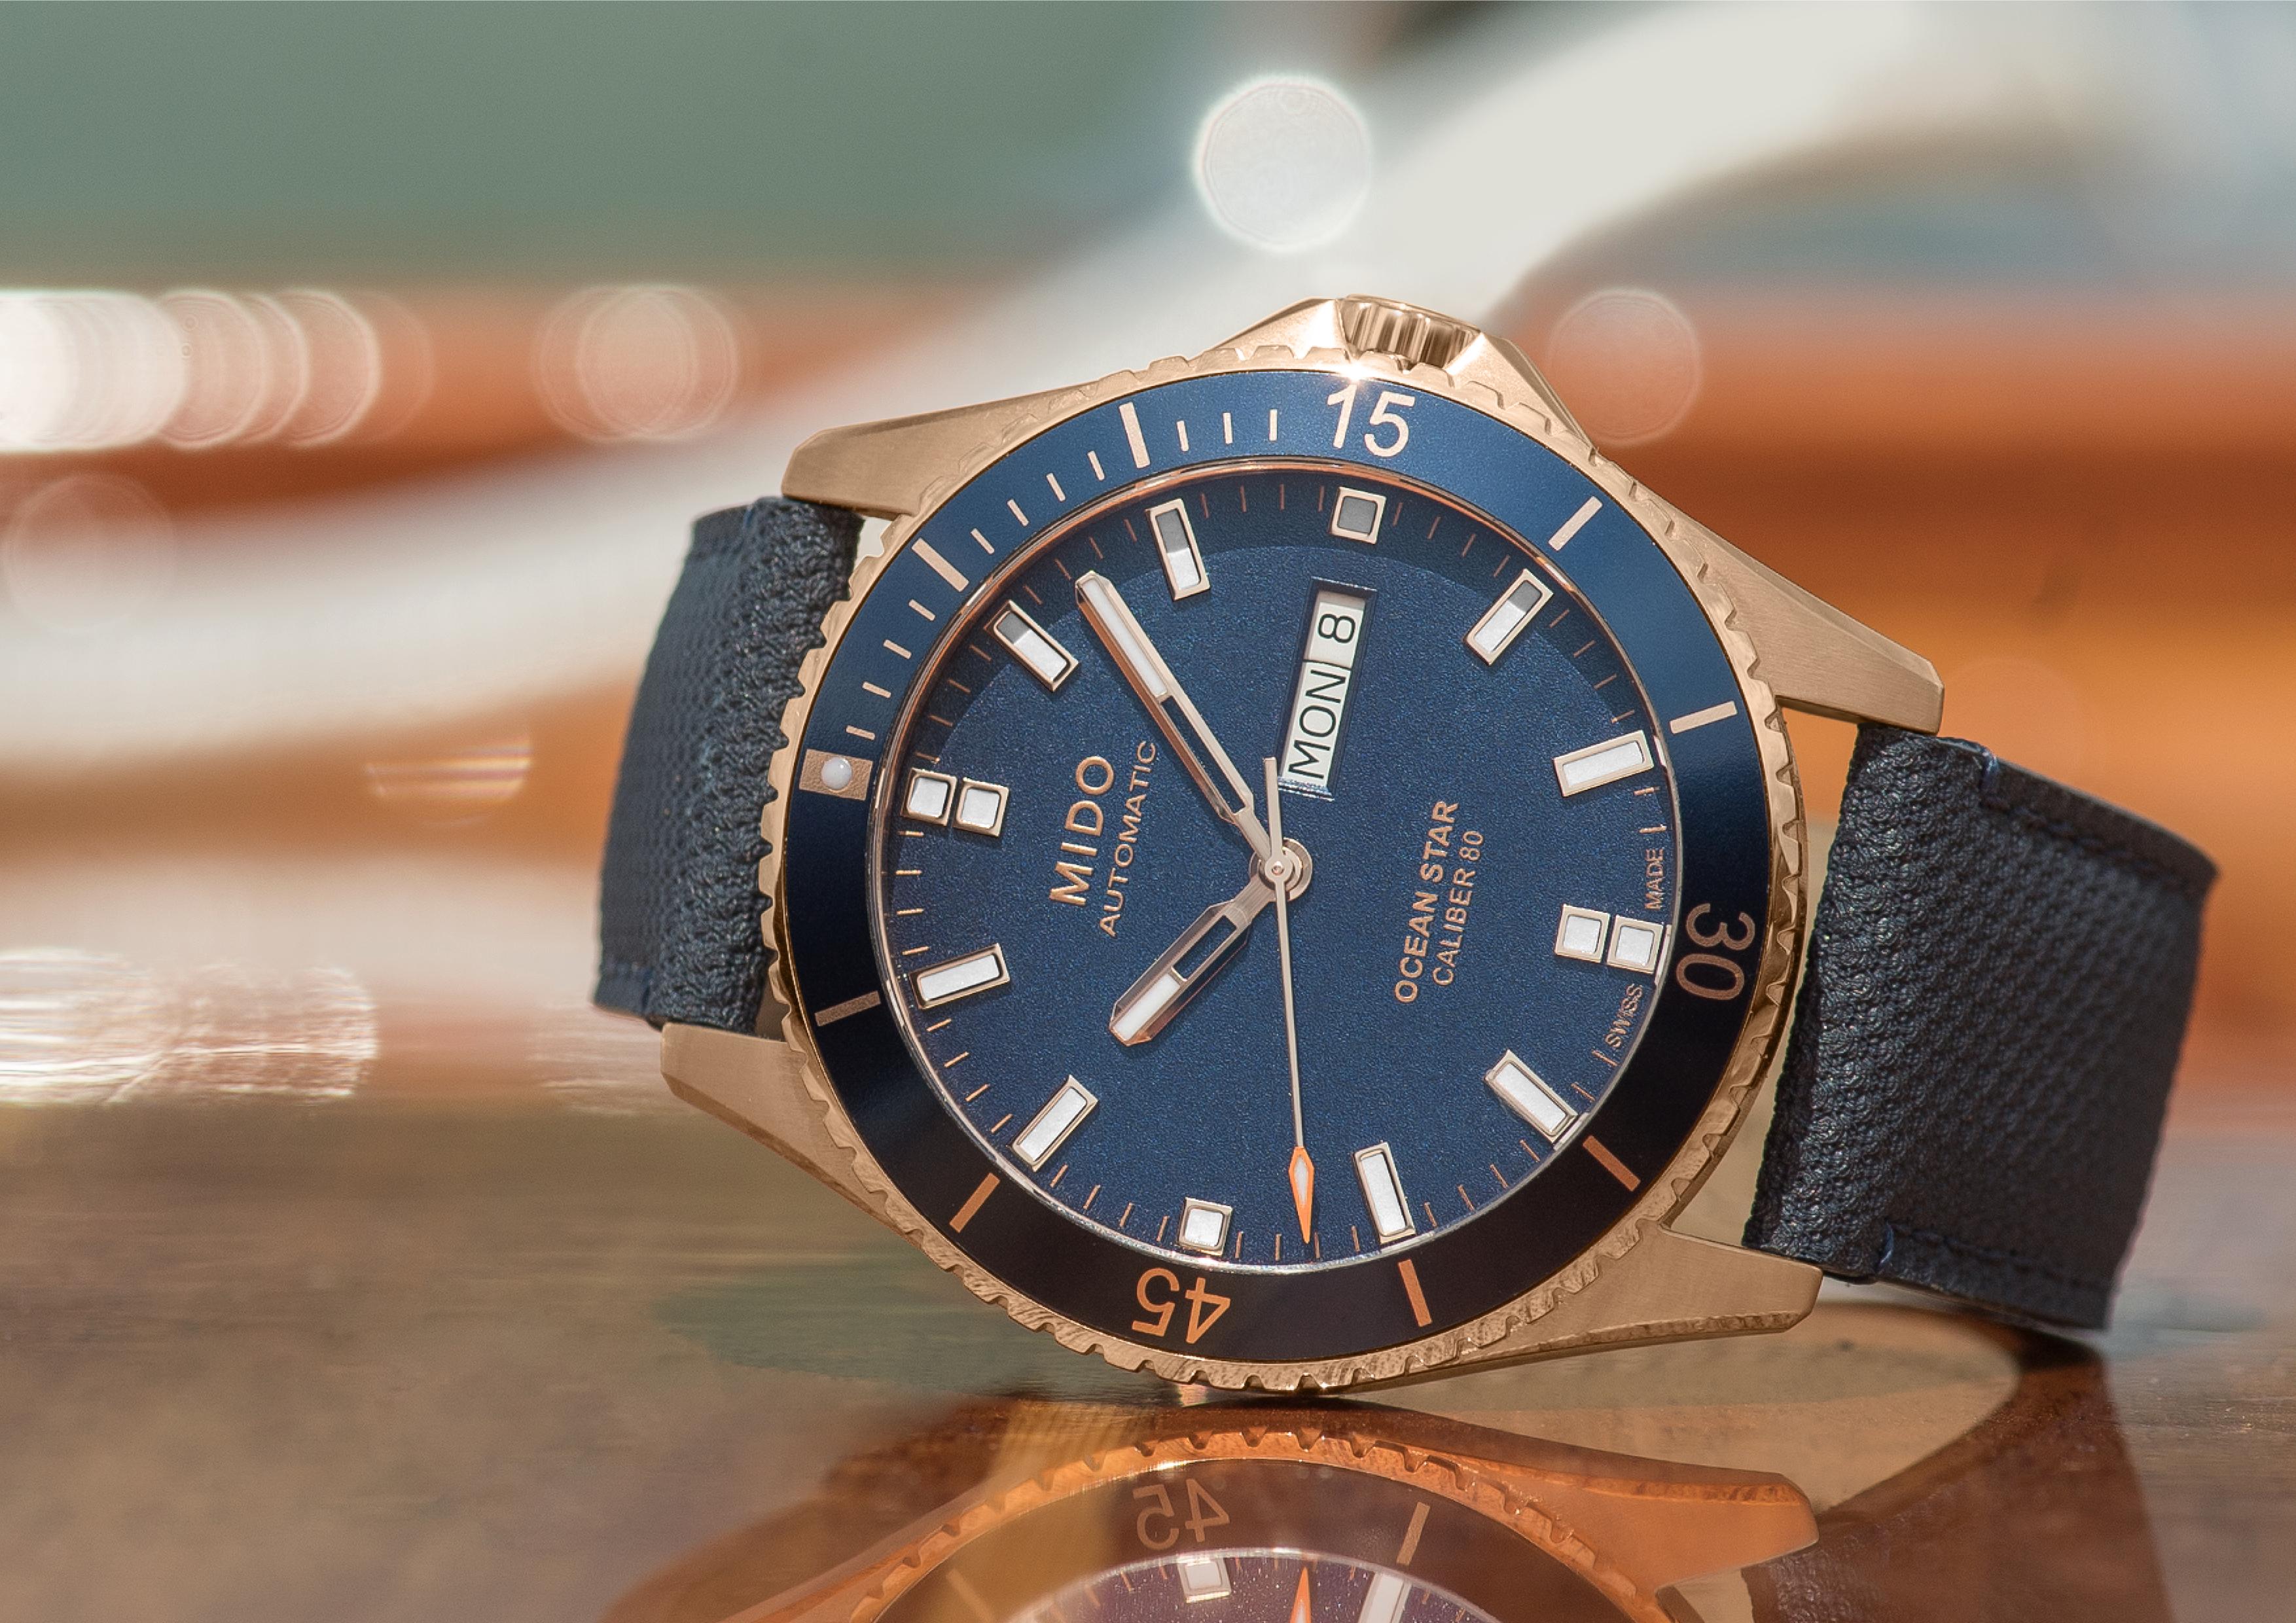 Transformer Un Tonneau En Bar wristwatches blog | the watch in focus | page 7